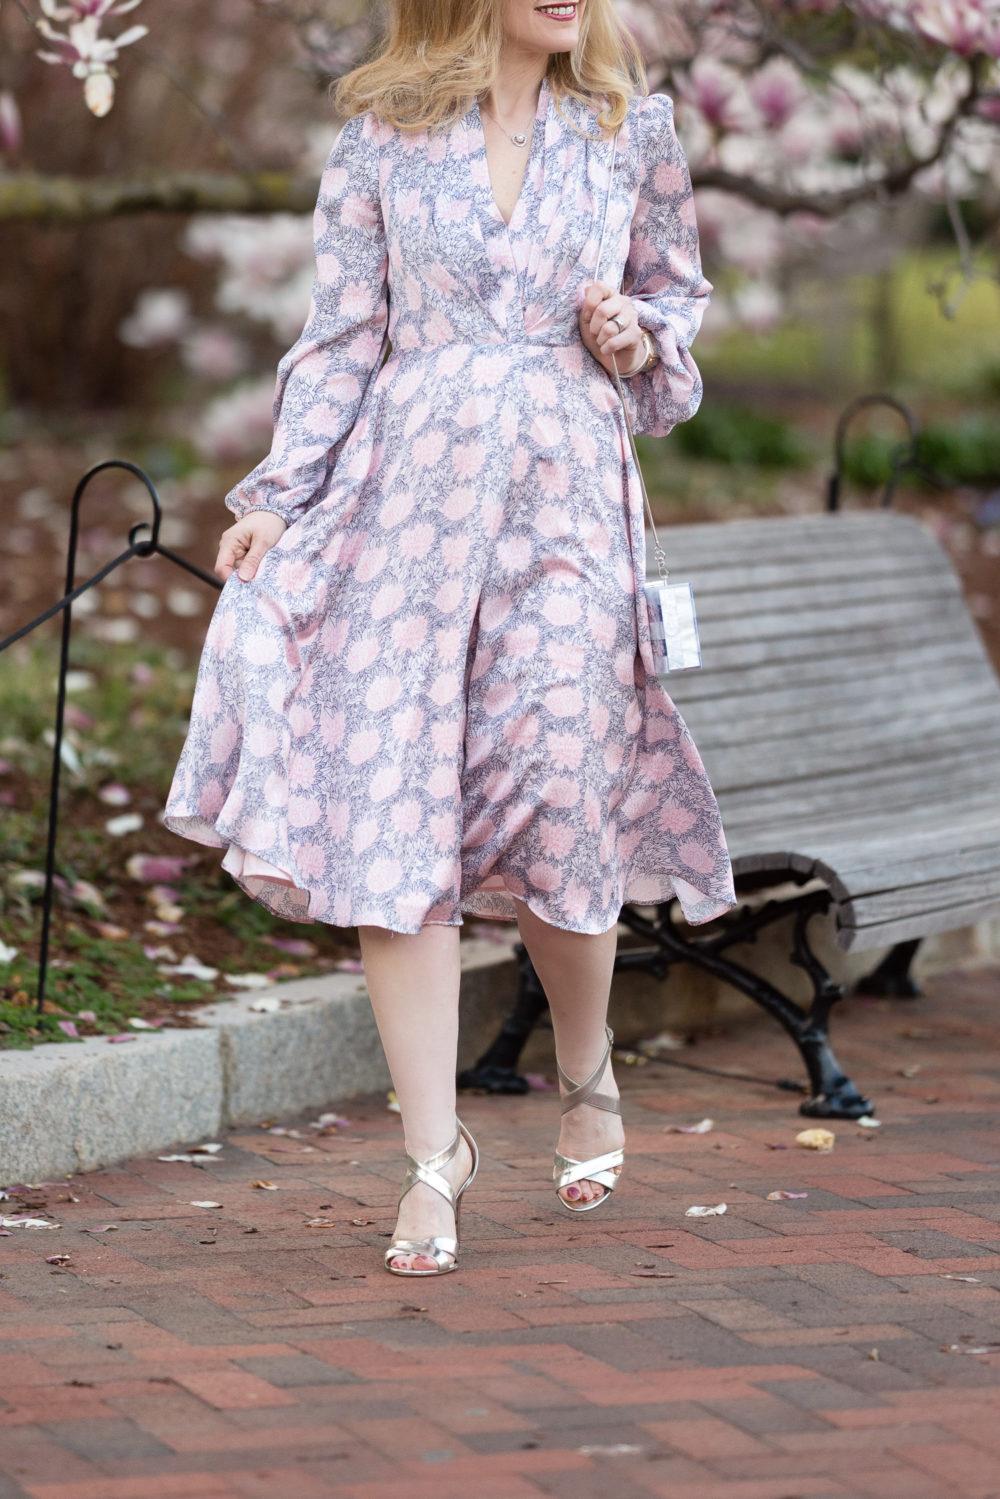 Petite Fashion Blog | Smithsonian Gardens | Gal Meets Glam Dresses | Magnolia Trees in Bloom | Magnolia Trees